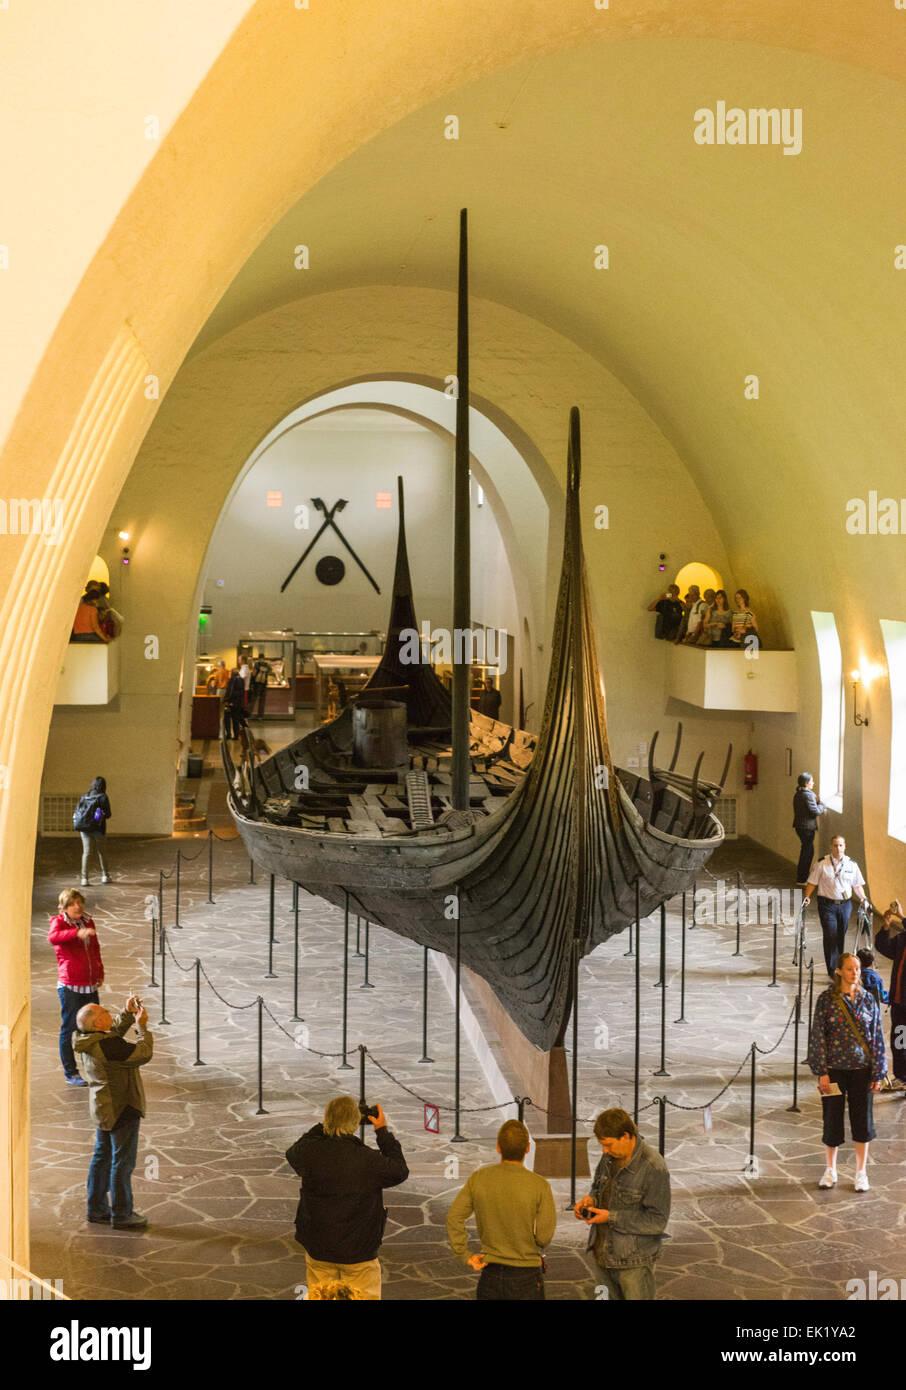 Oseberg ship at the Viking Ship Museum, Bygdøy, Oslo, Norway. Stock Photo